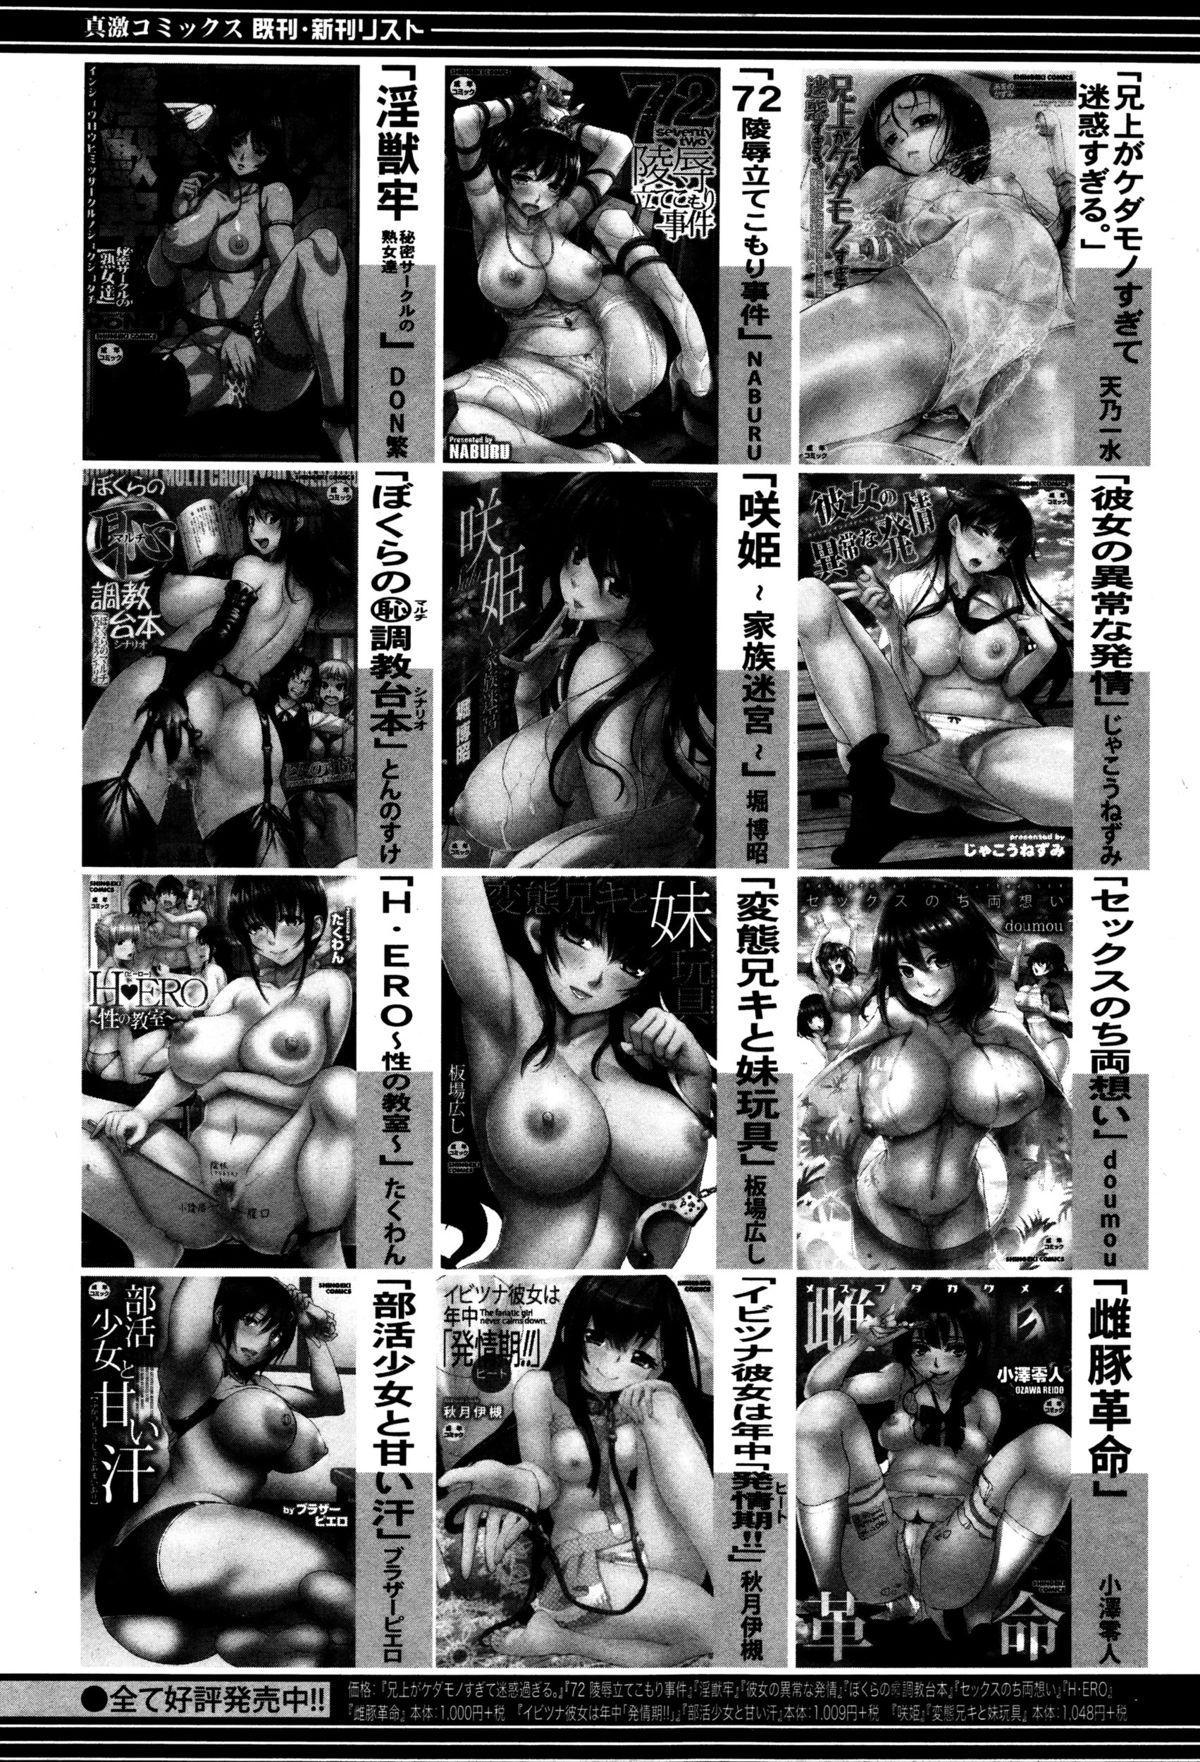 COMIC Shingeki 2016-01 328